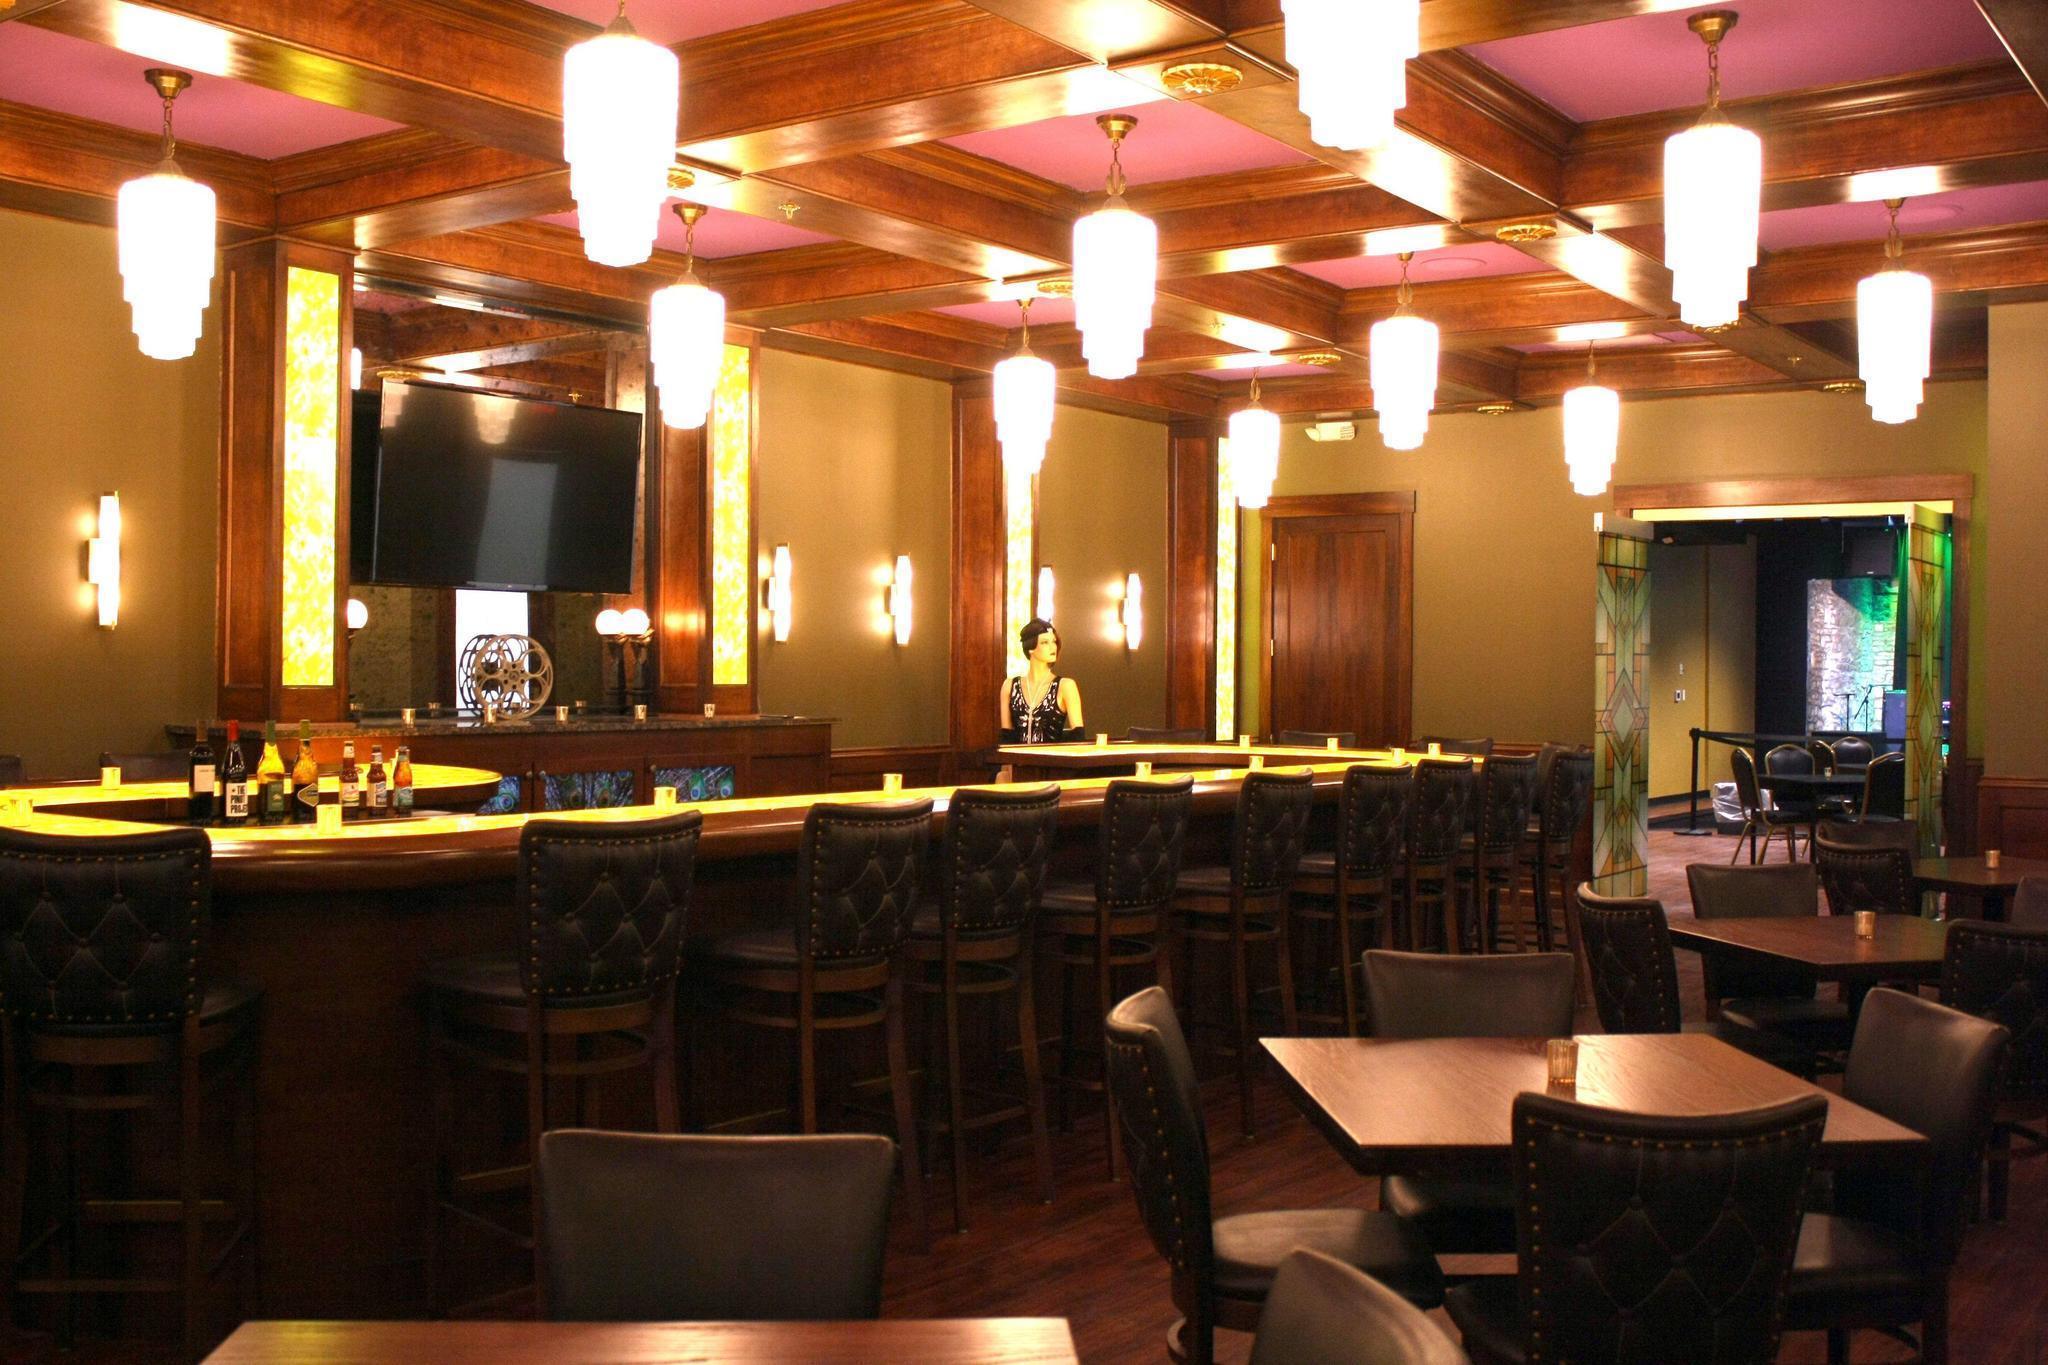 New Lenox Illinois >> Lockport's historic Roxy theater gets a redo - Daily Southtown